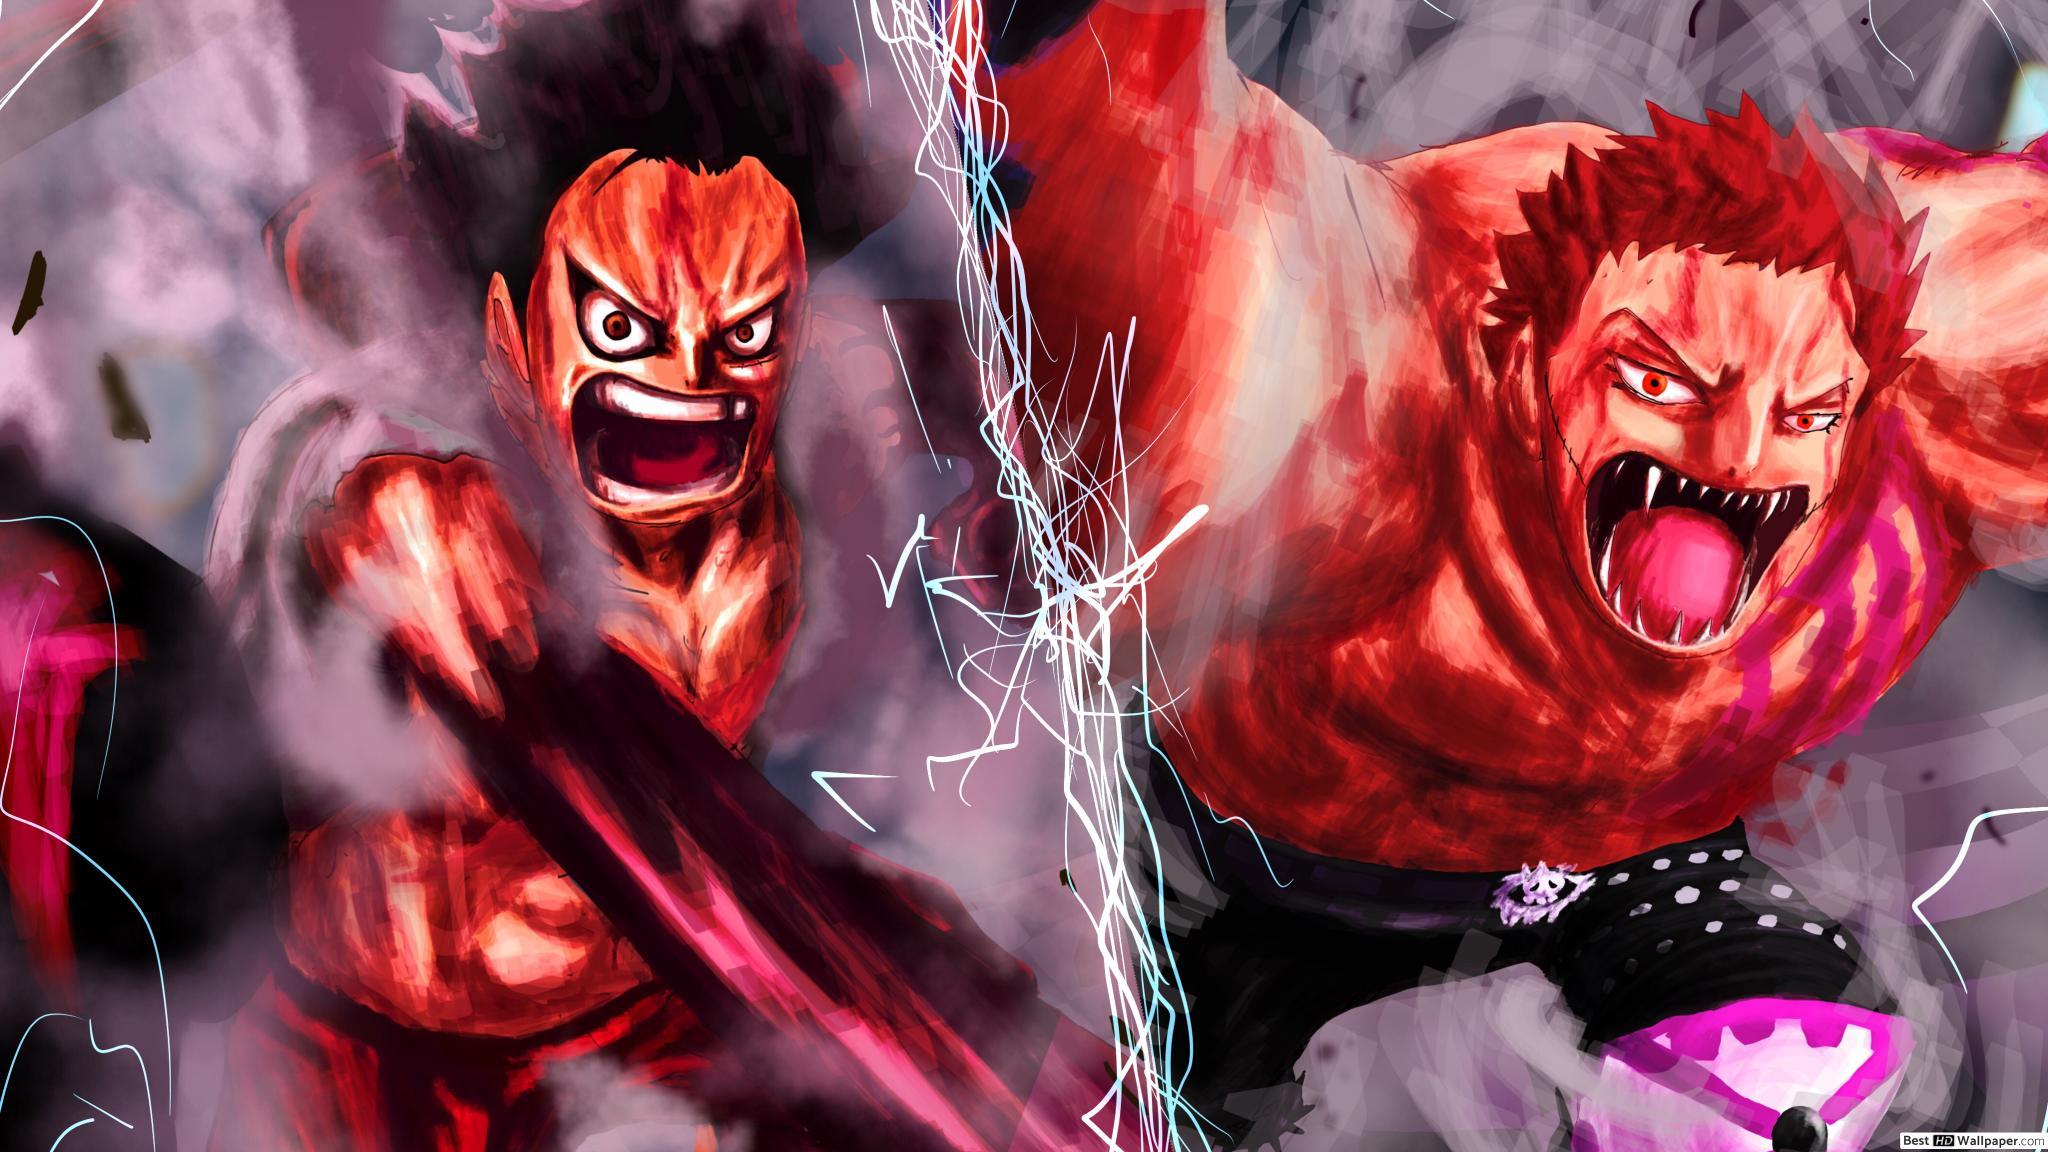 One Piece - Charlotte Katakuri Vs Monkey D. Luffy Hd Duvar serapportantà Dessin Animé De One Piece